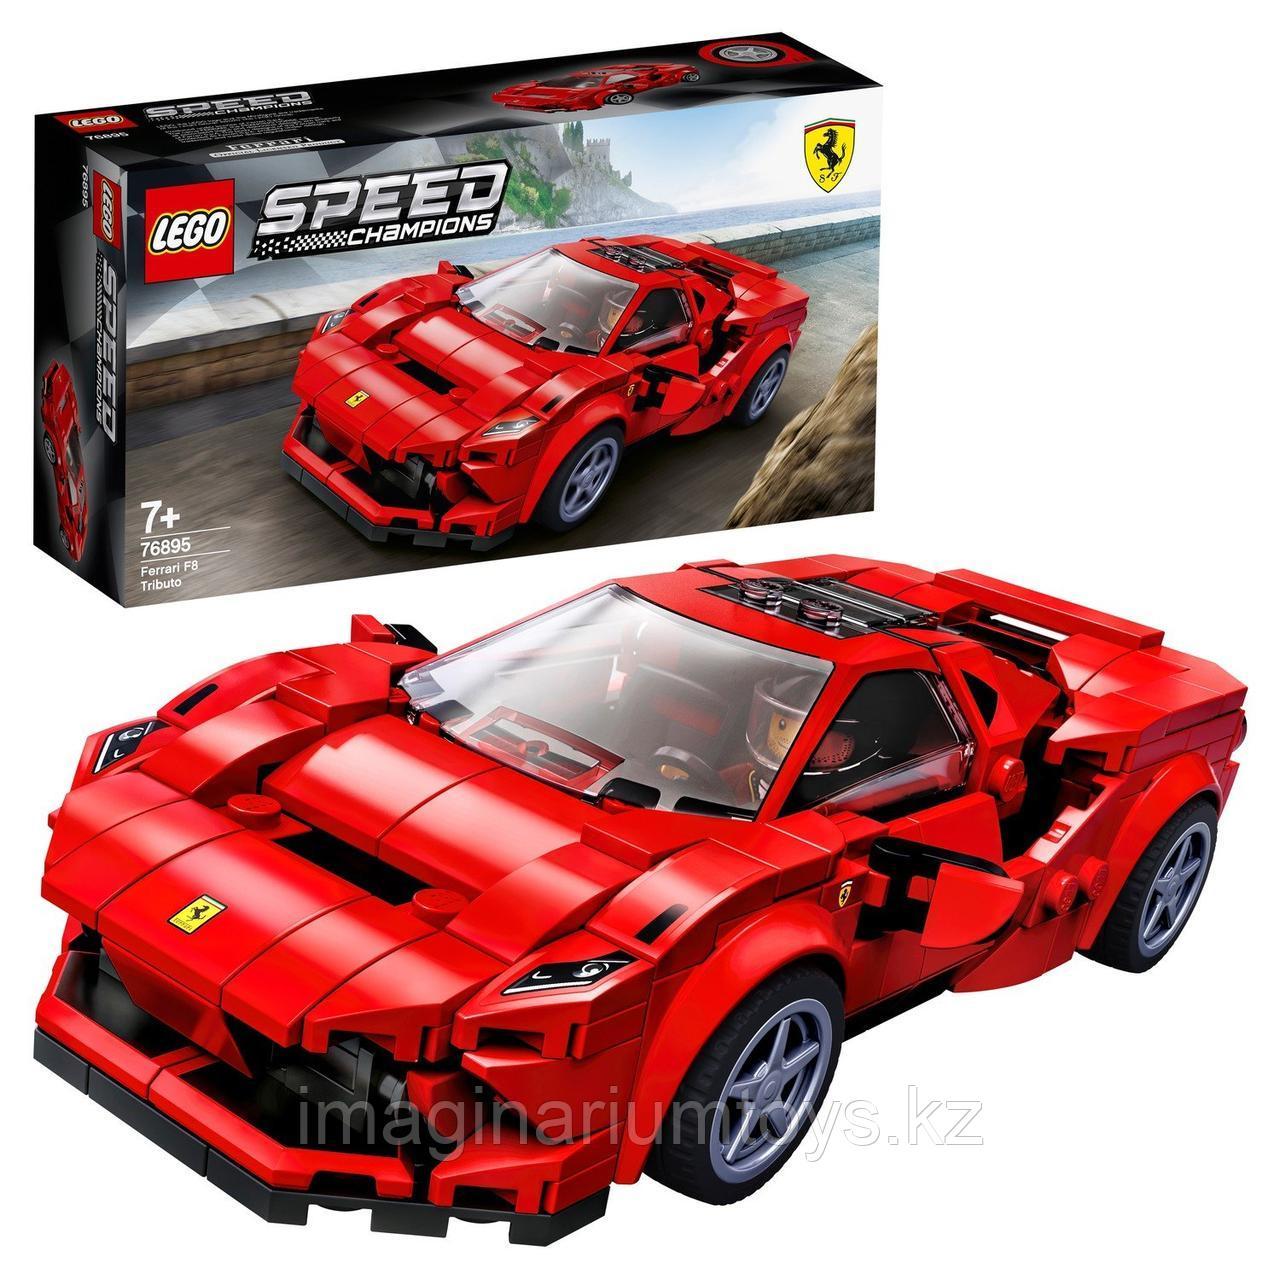 Lego Конструктор автомобиль Ferrari F8 Tributo 76895 Speed